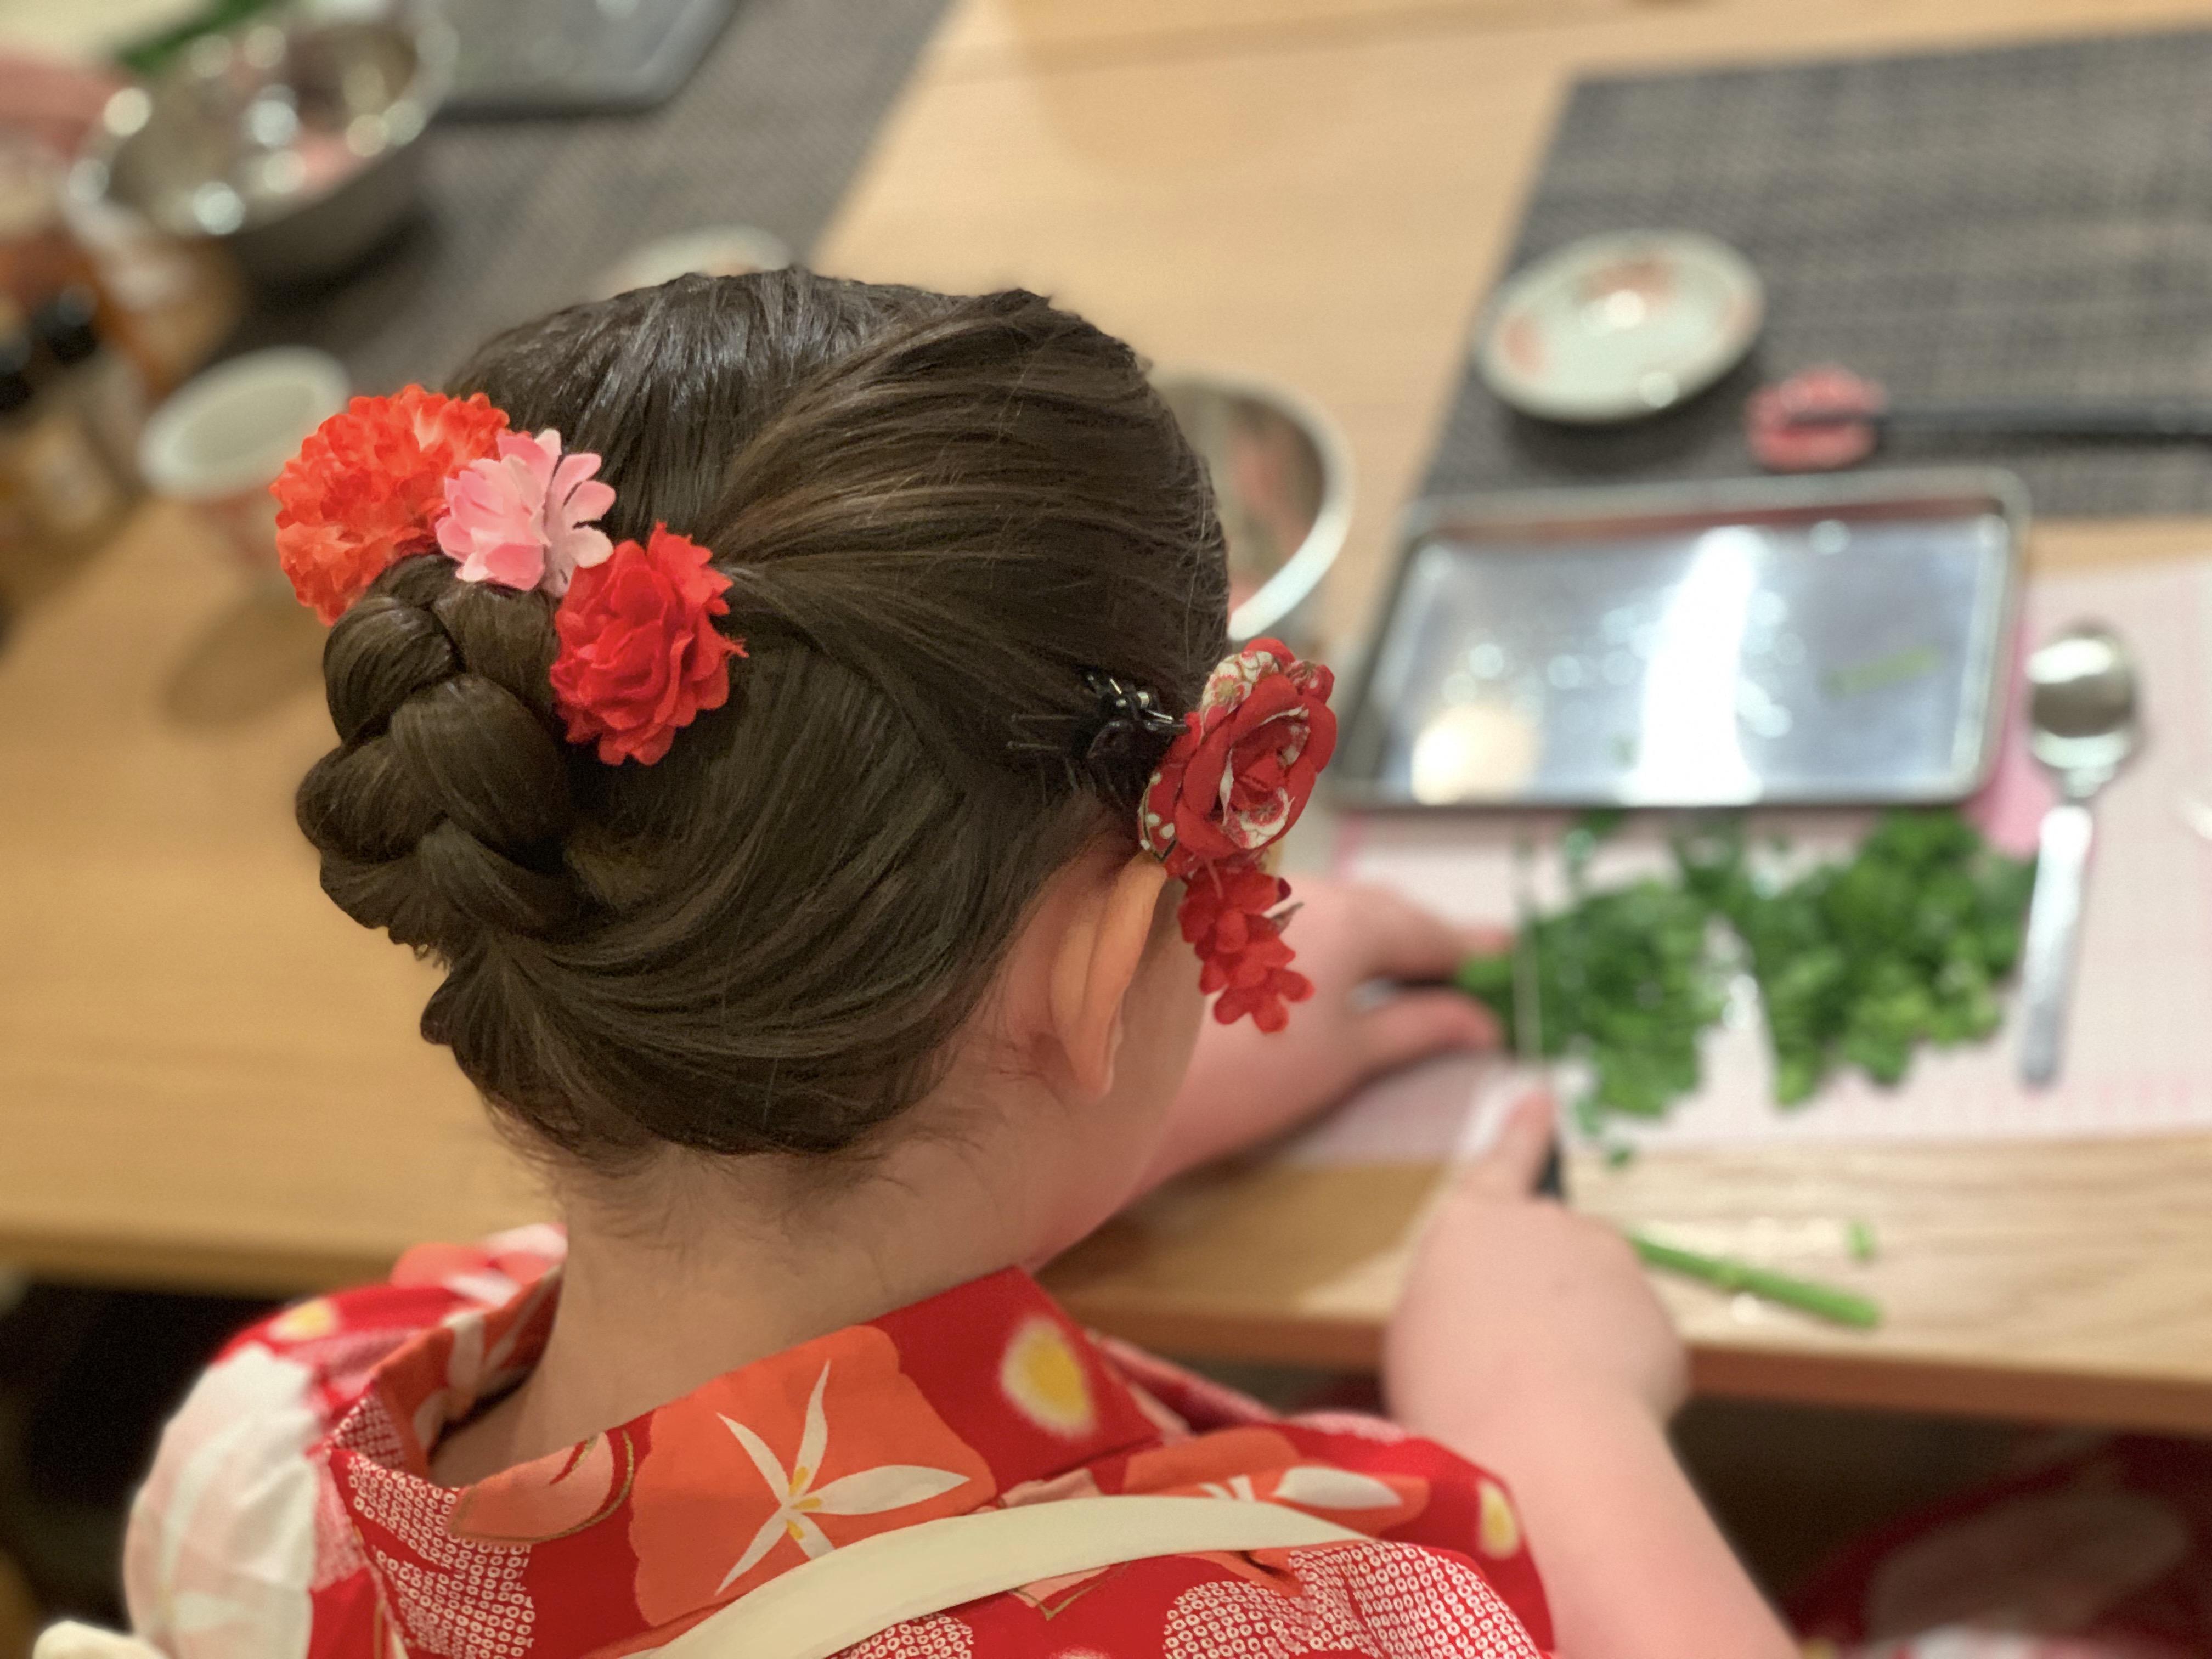 Gyoza (Japanese dumplings) making in the center of Kyoto